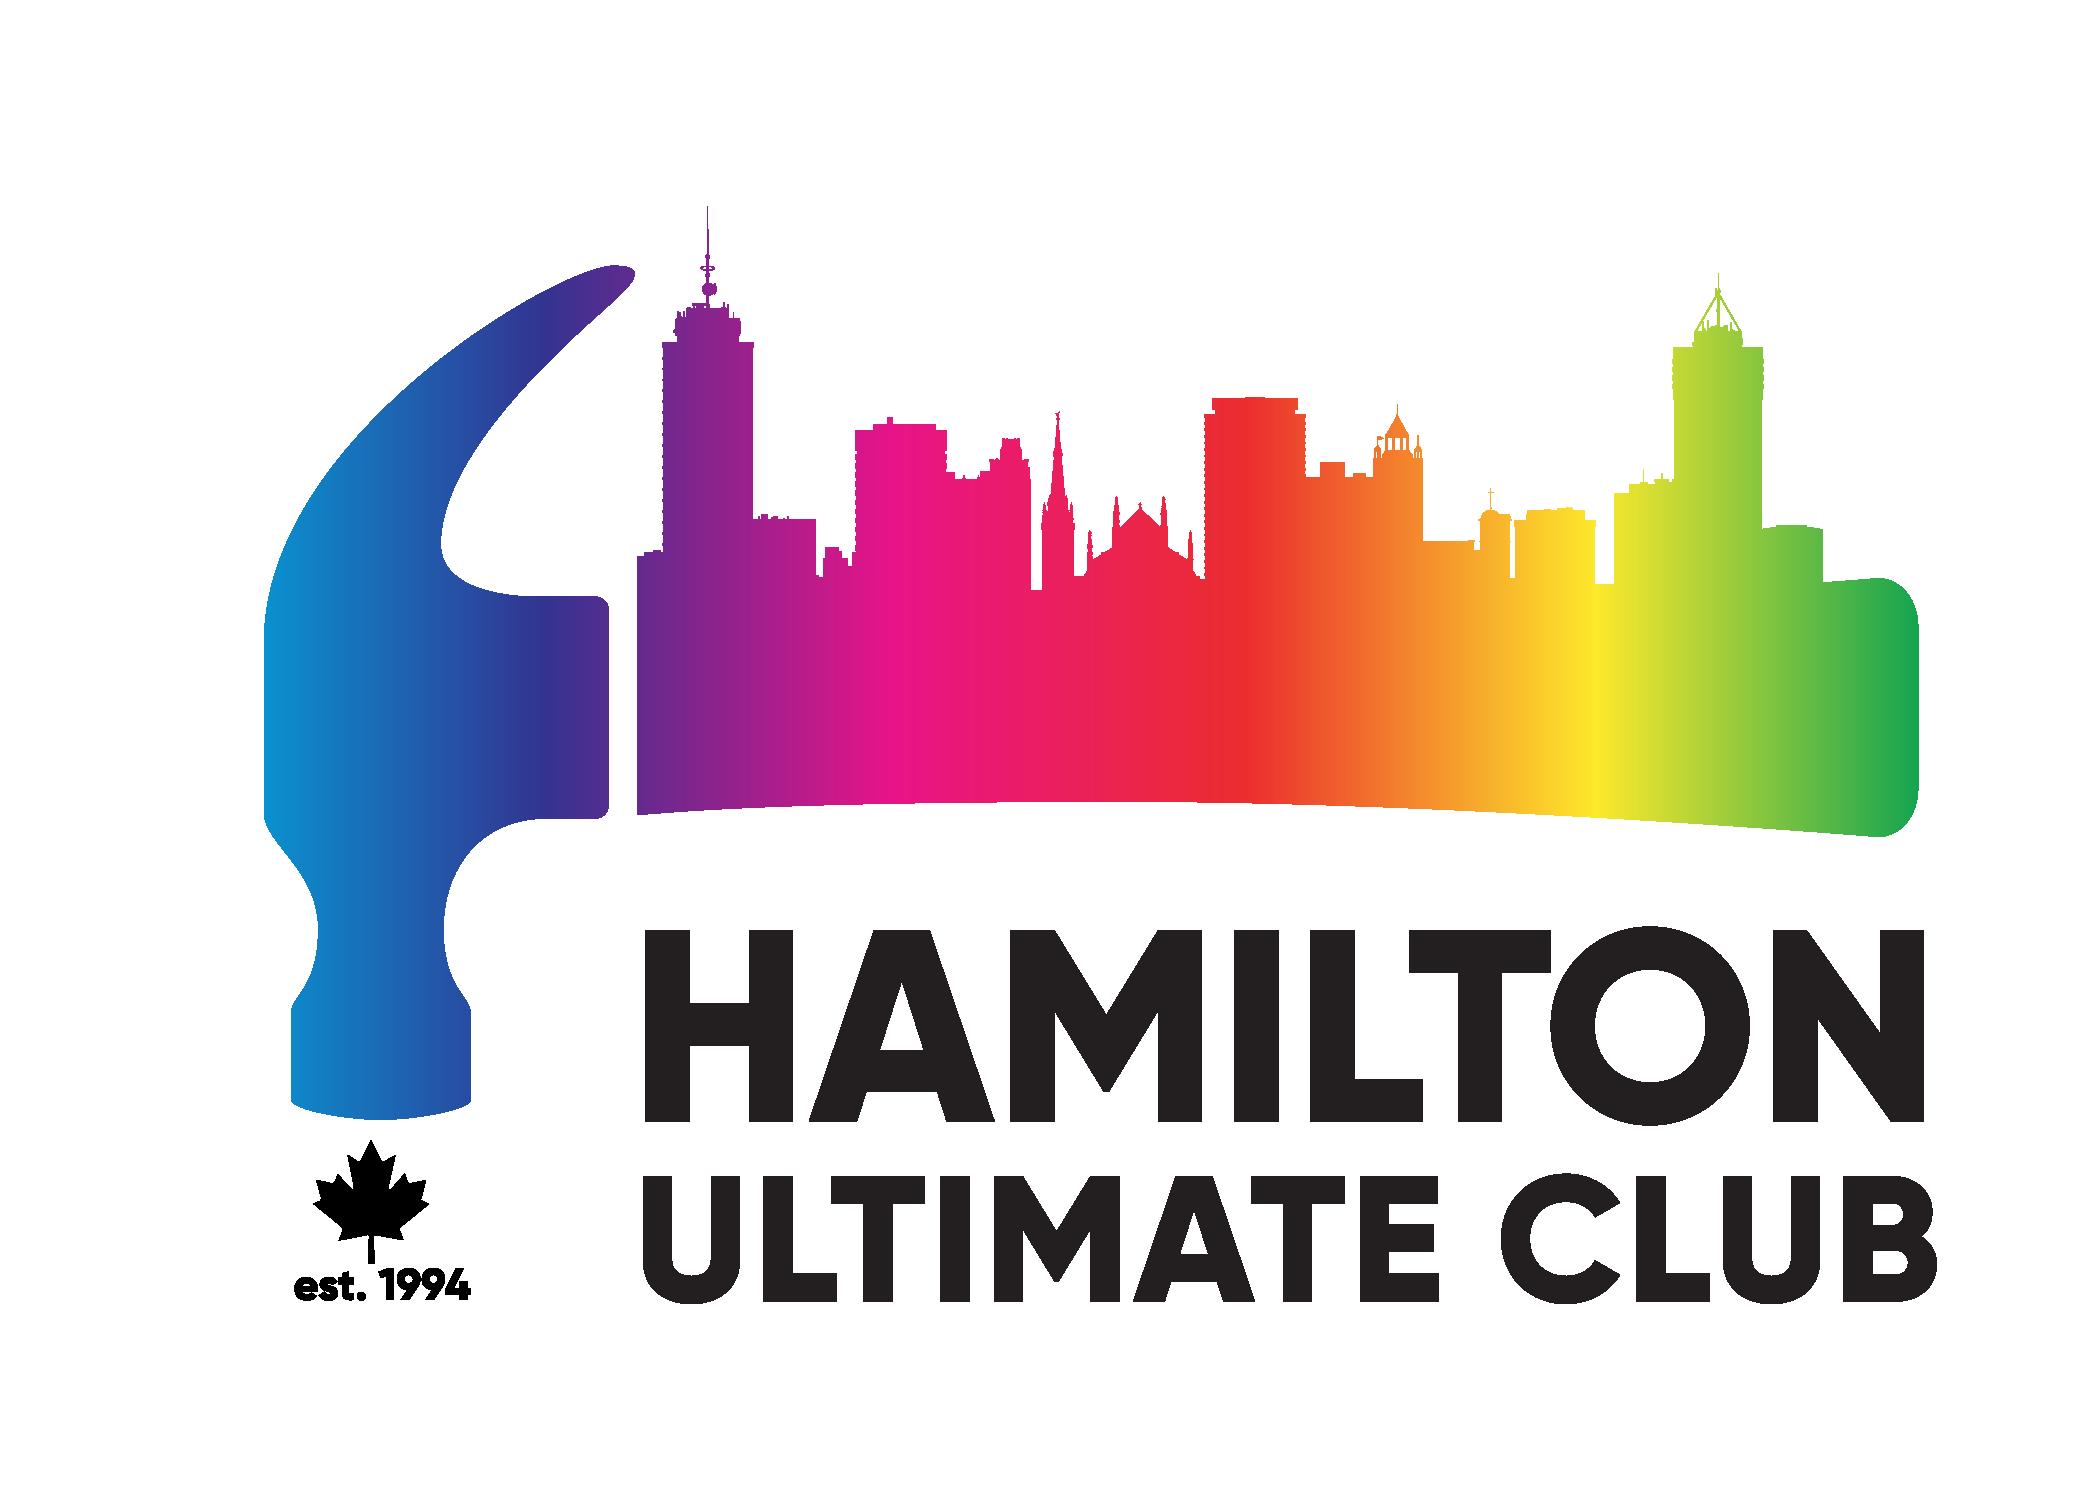 Hamilton Ultimate Club